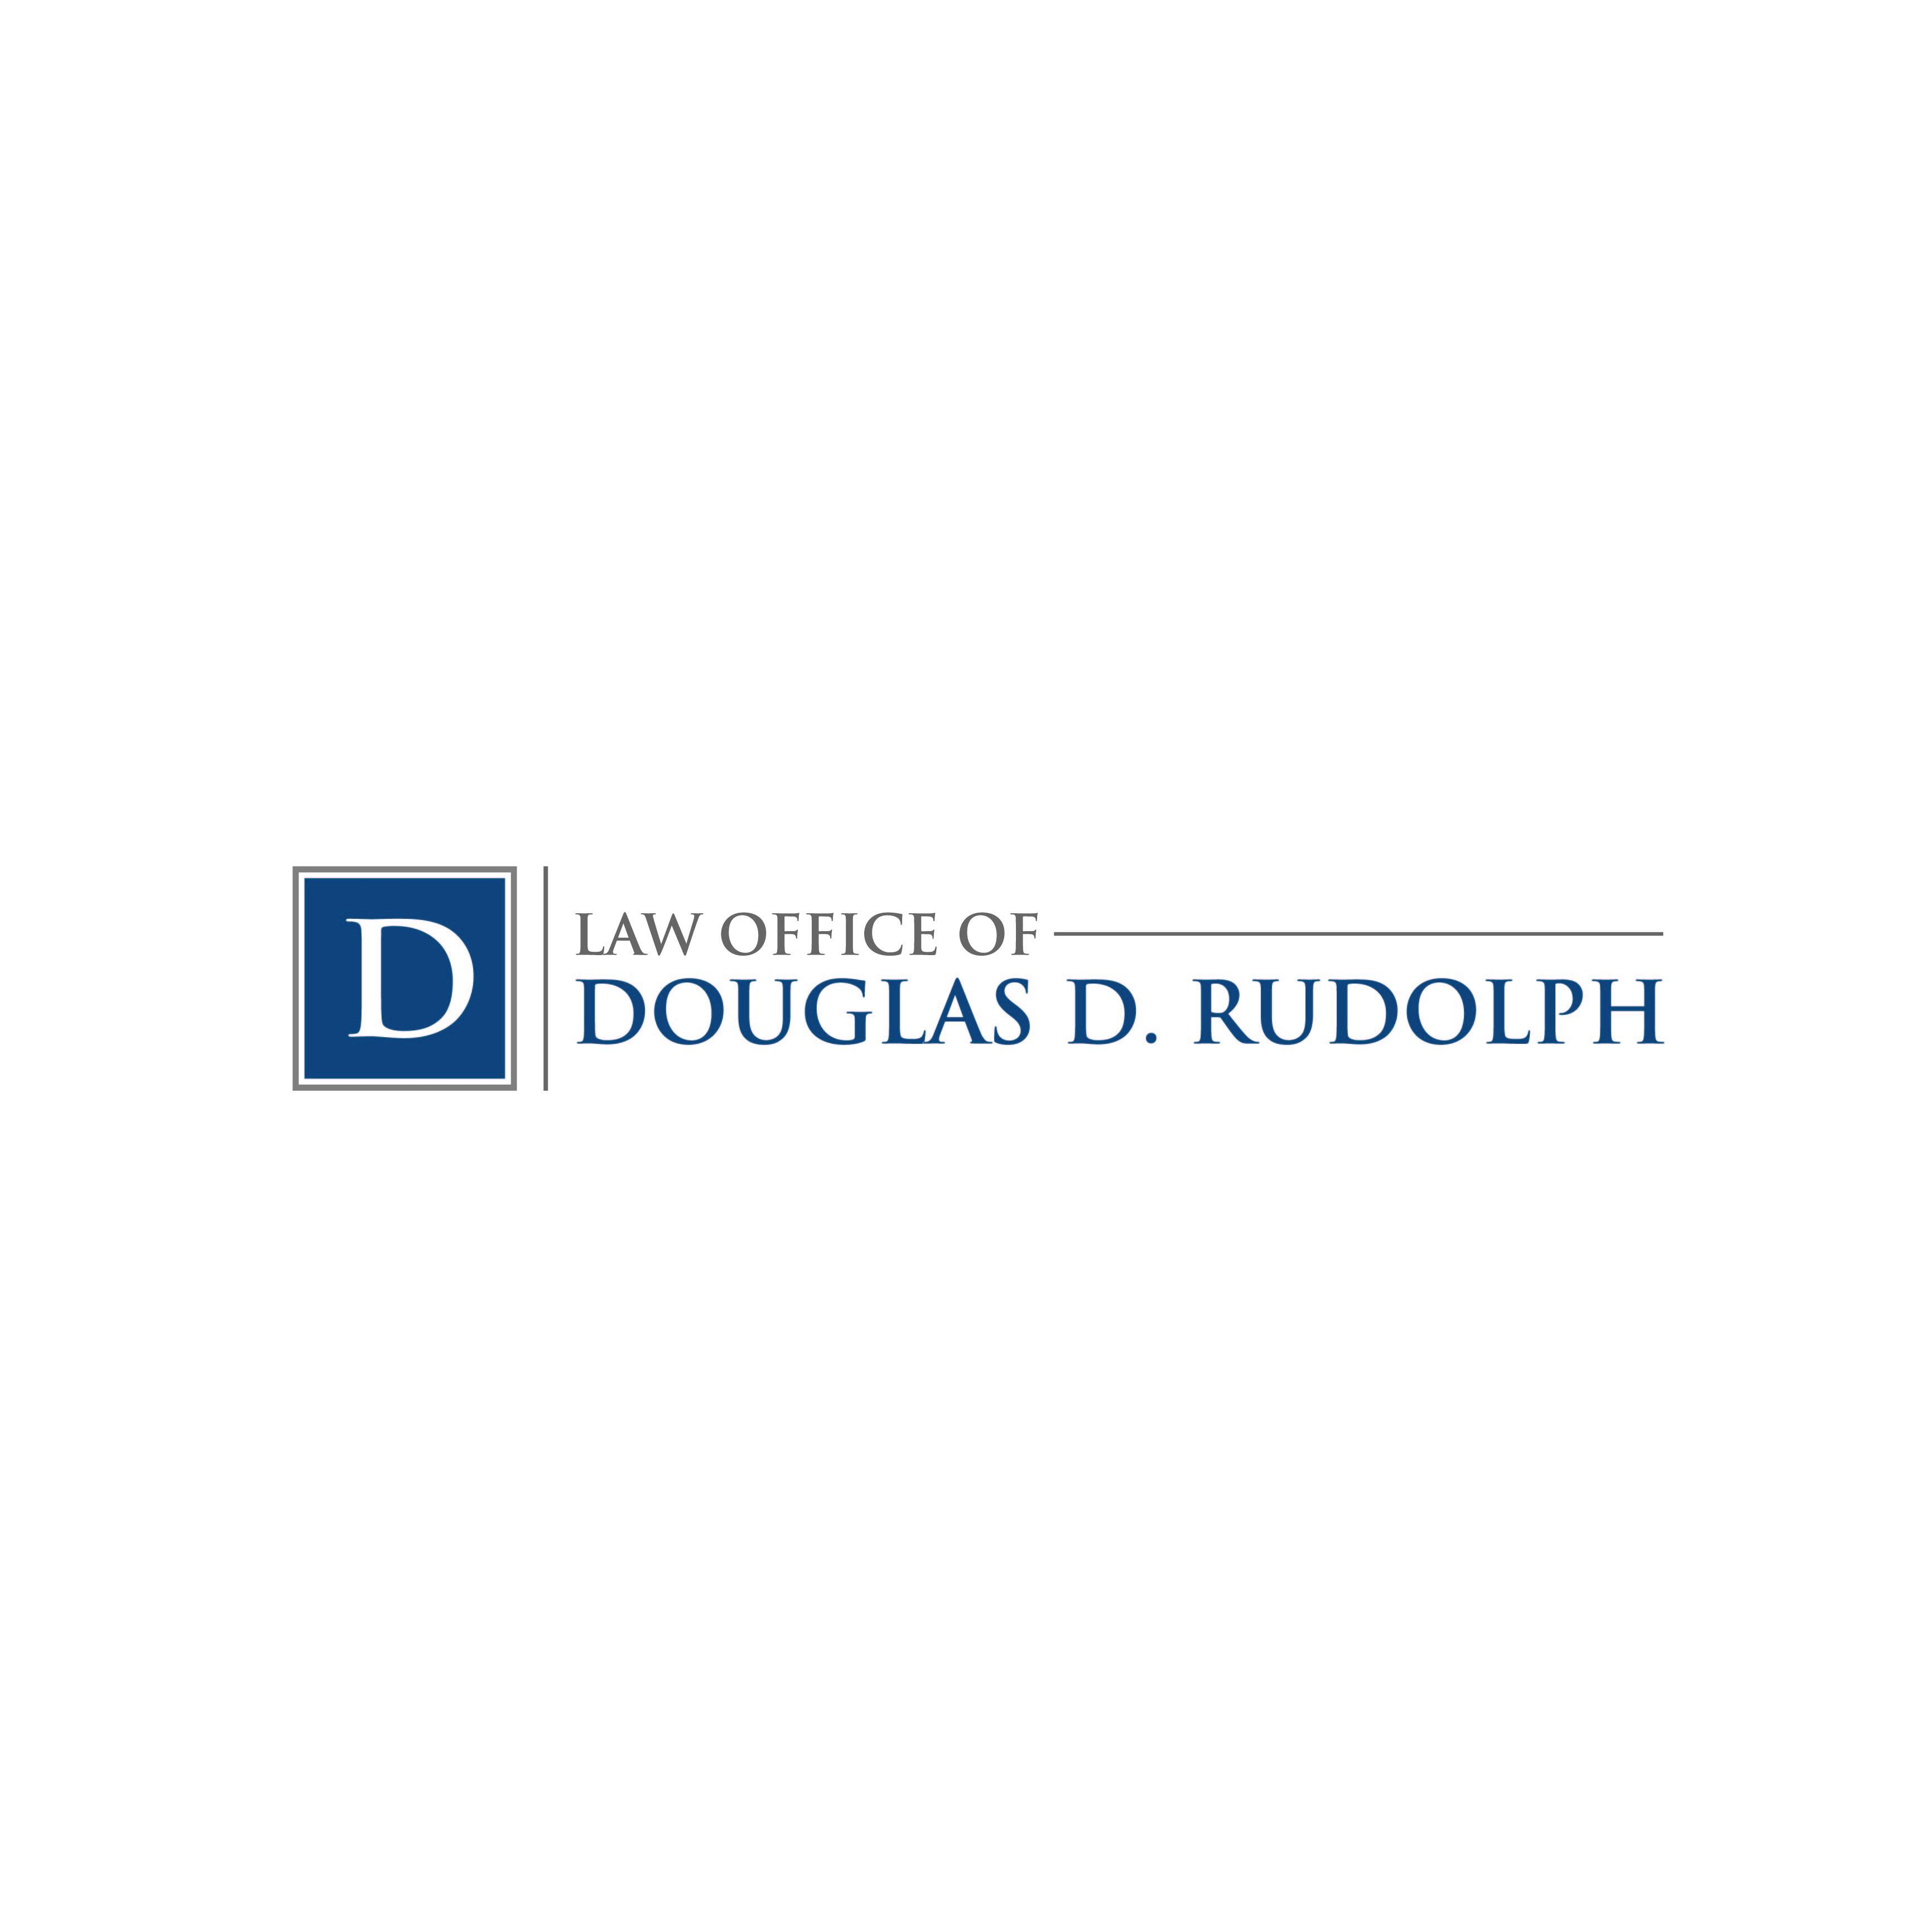 Law Office of Douglas D. Rudolph